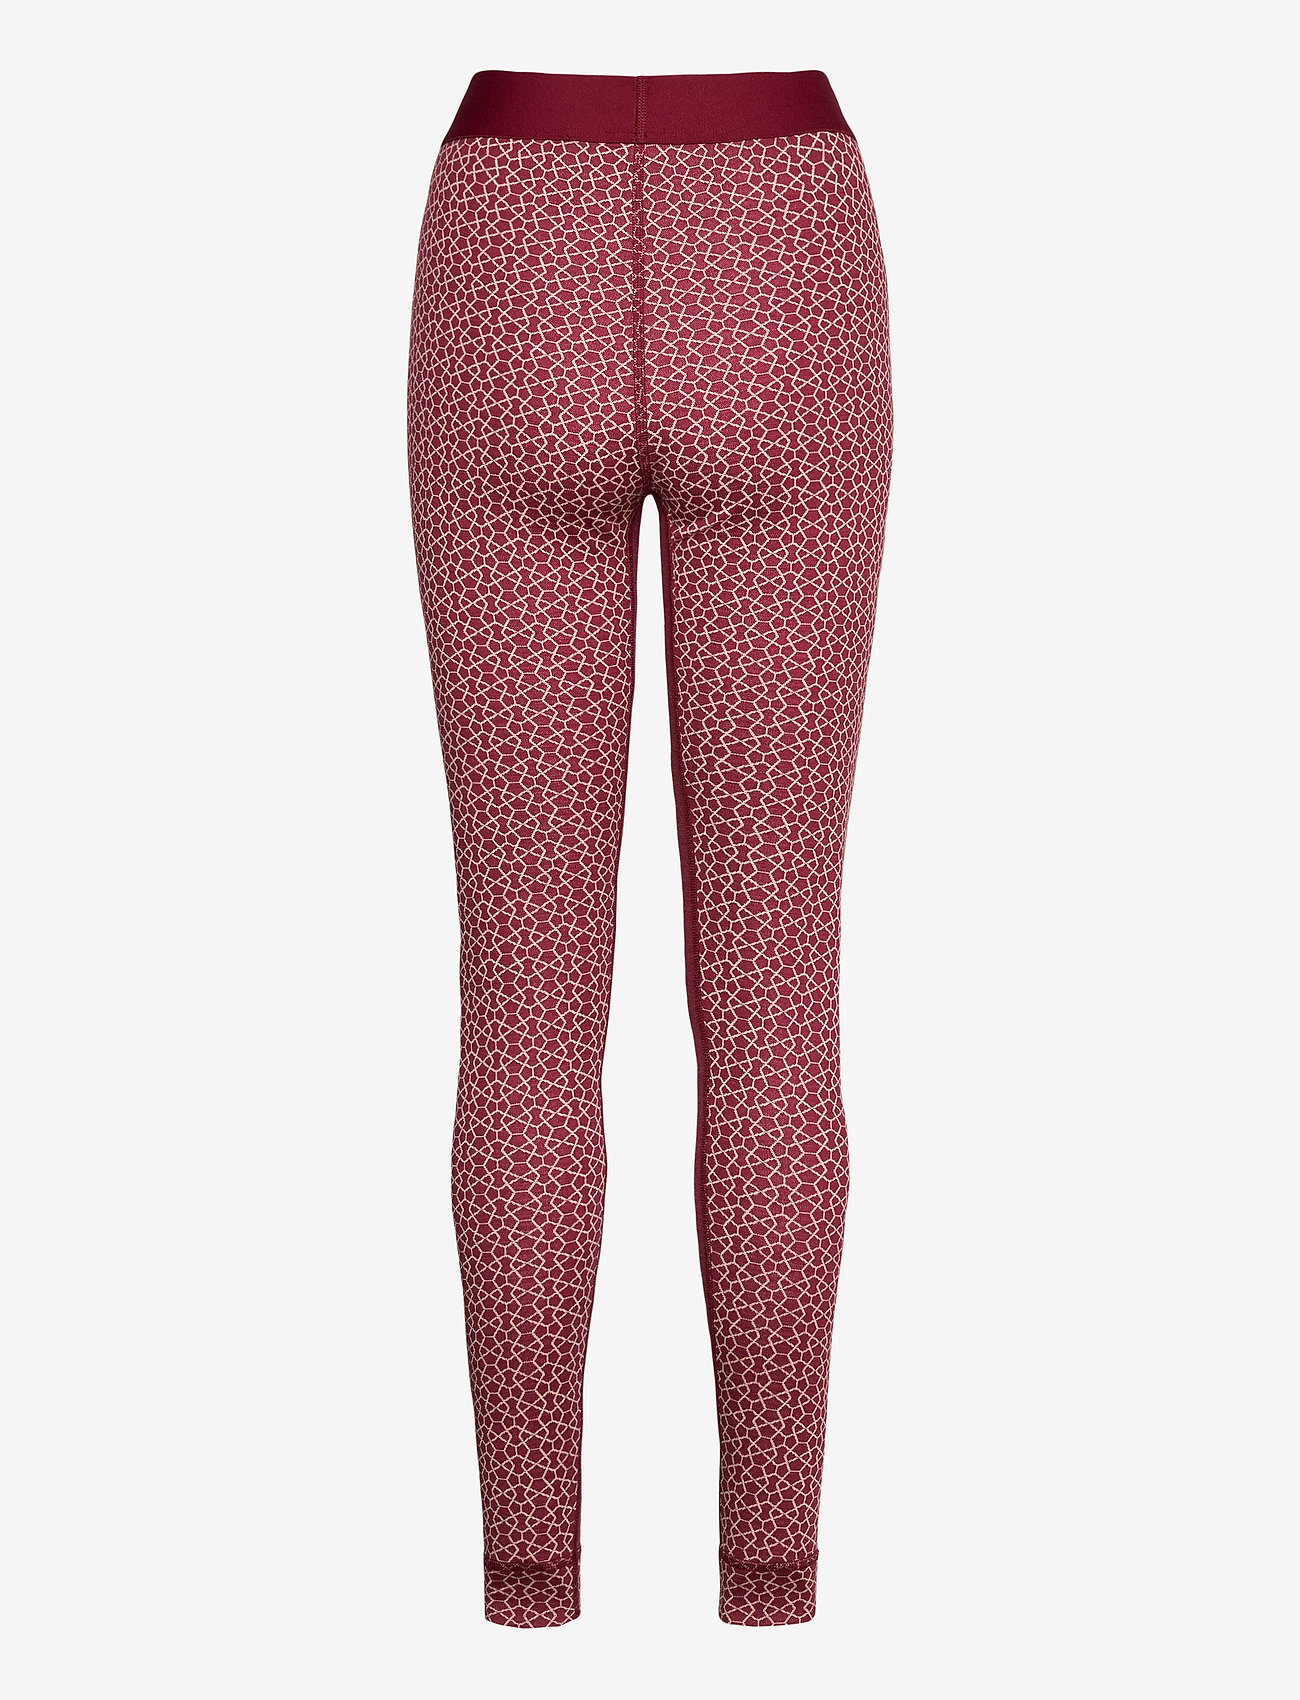 Craft - MERINO 240 PANTS W - nederdelar - rhubarg/touch - 1